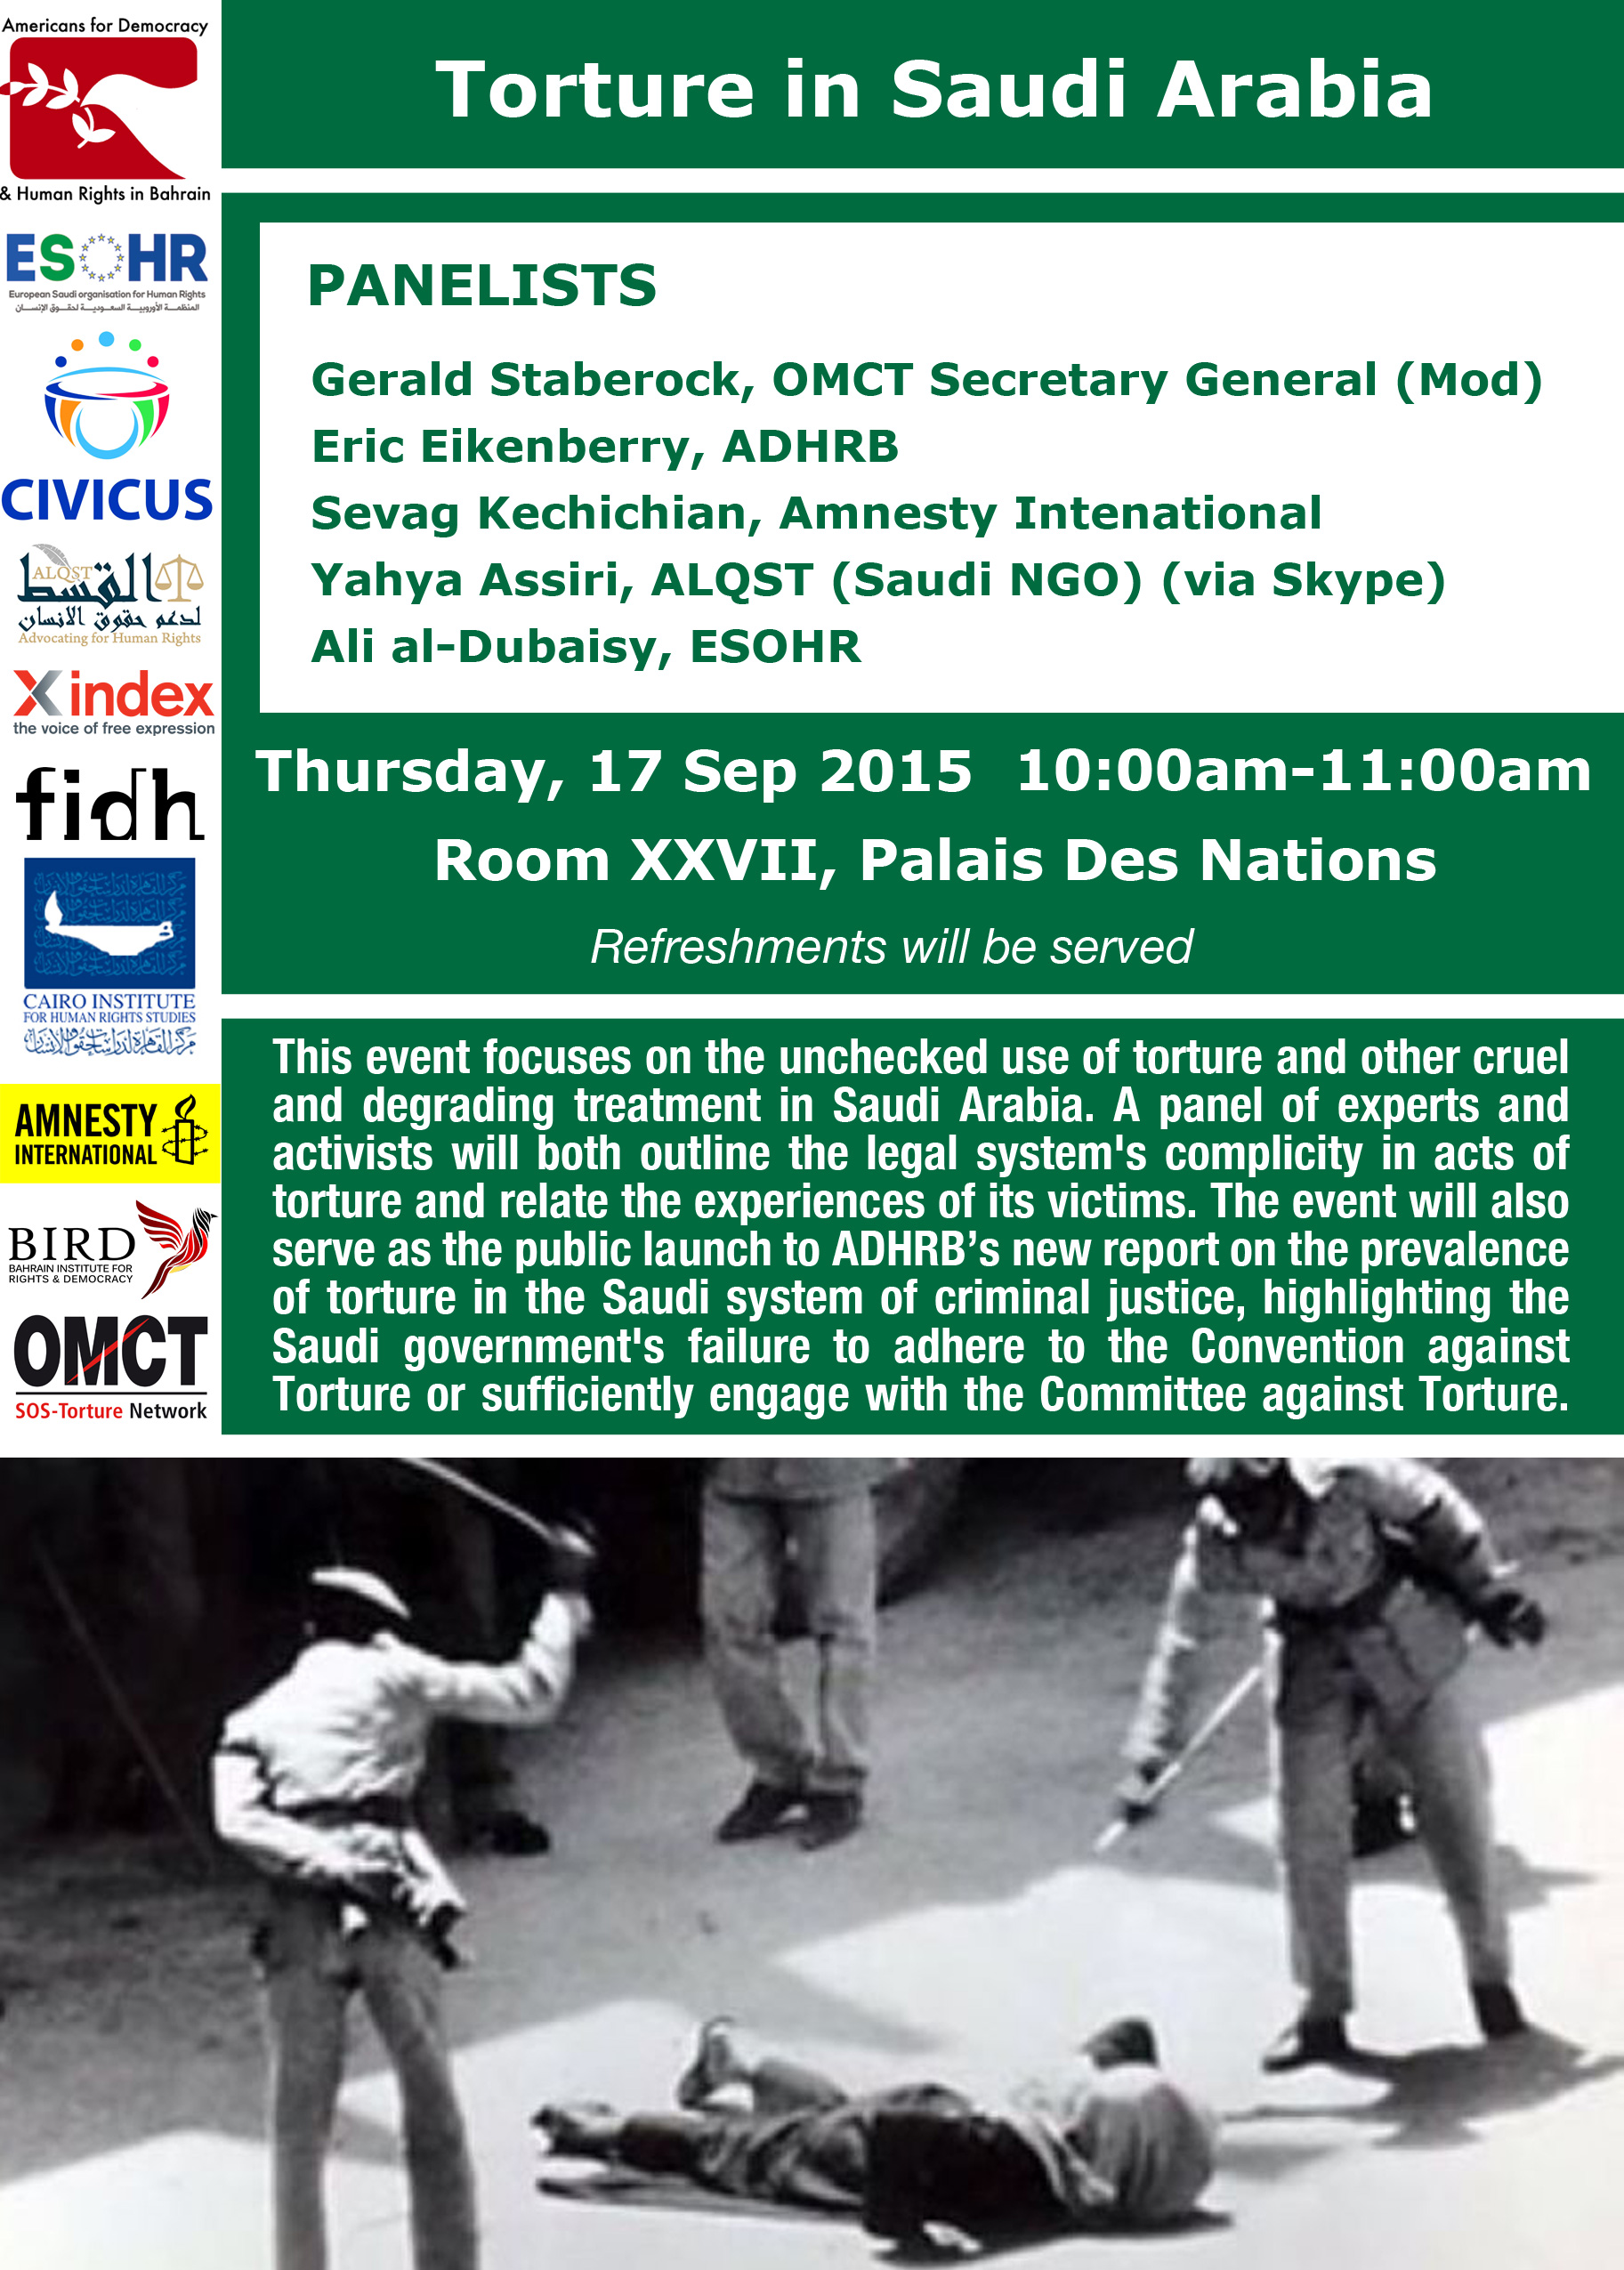 Upcoming Event at HRC 30 – Torture in Saudi Arabia